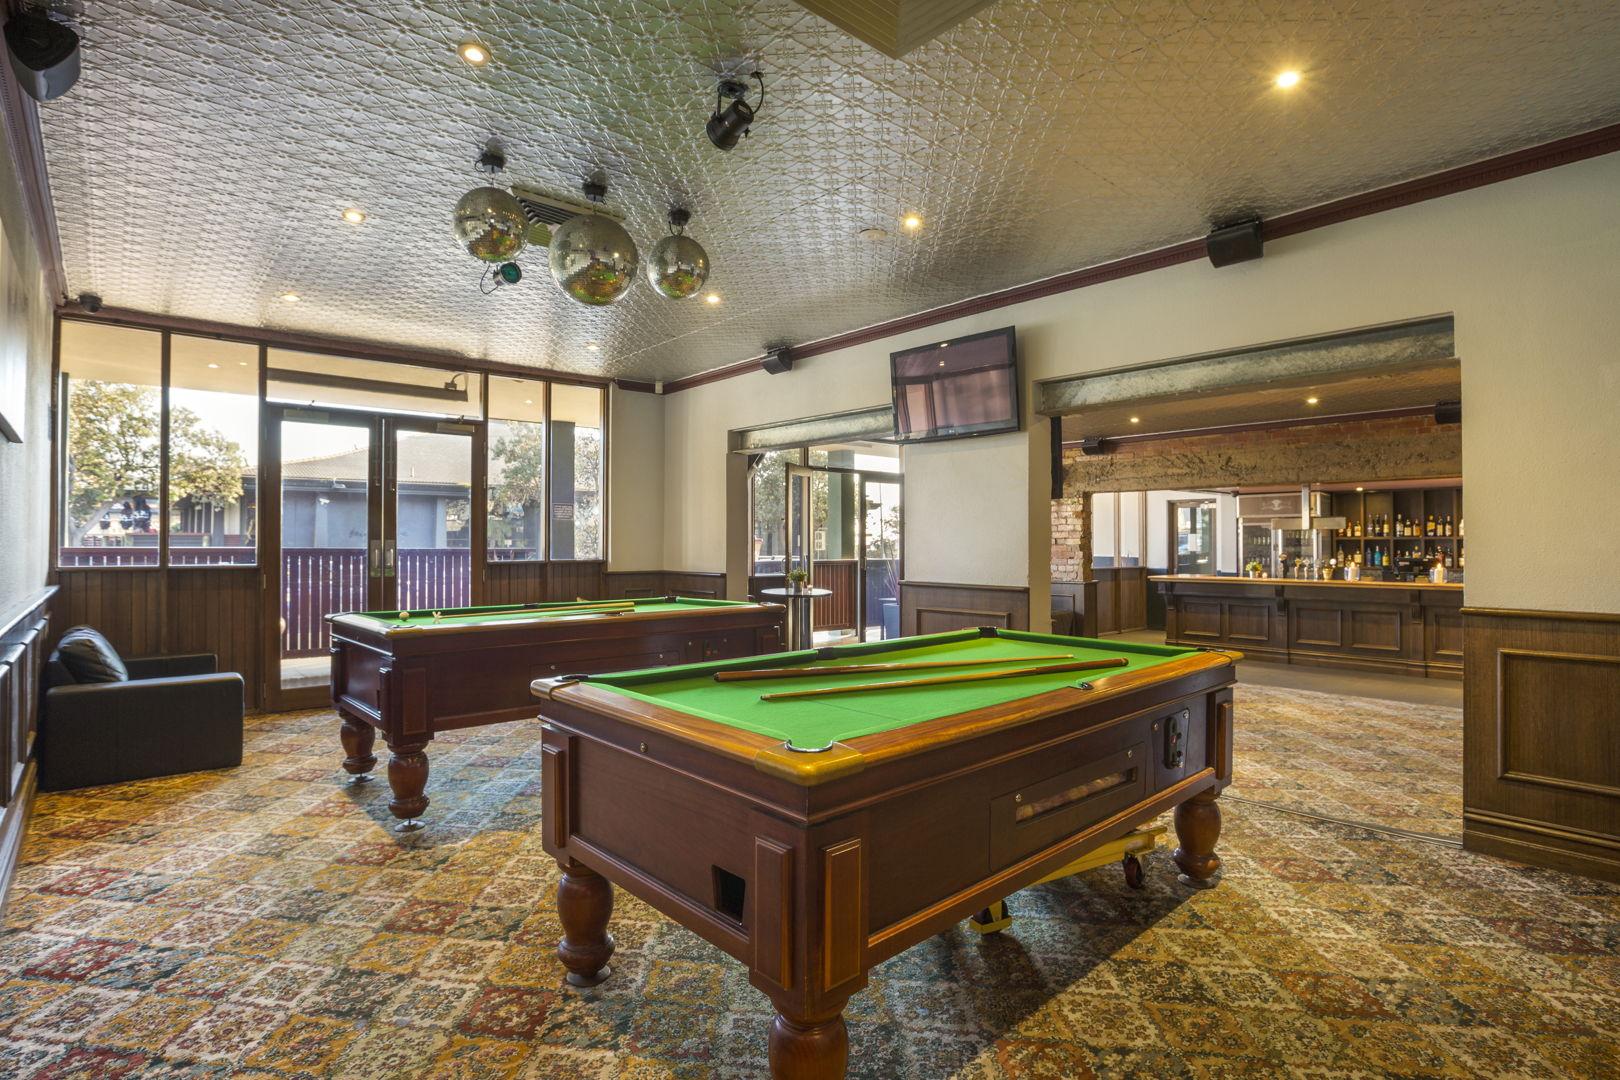 pier-hotel-flanagans-irish-bar (1).jpg